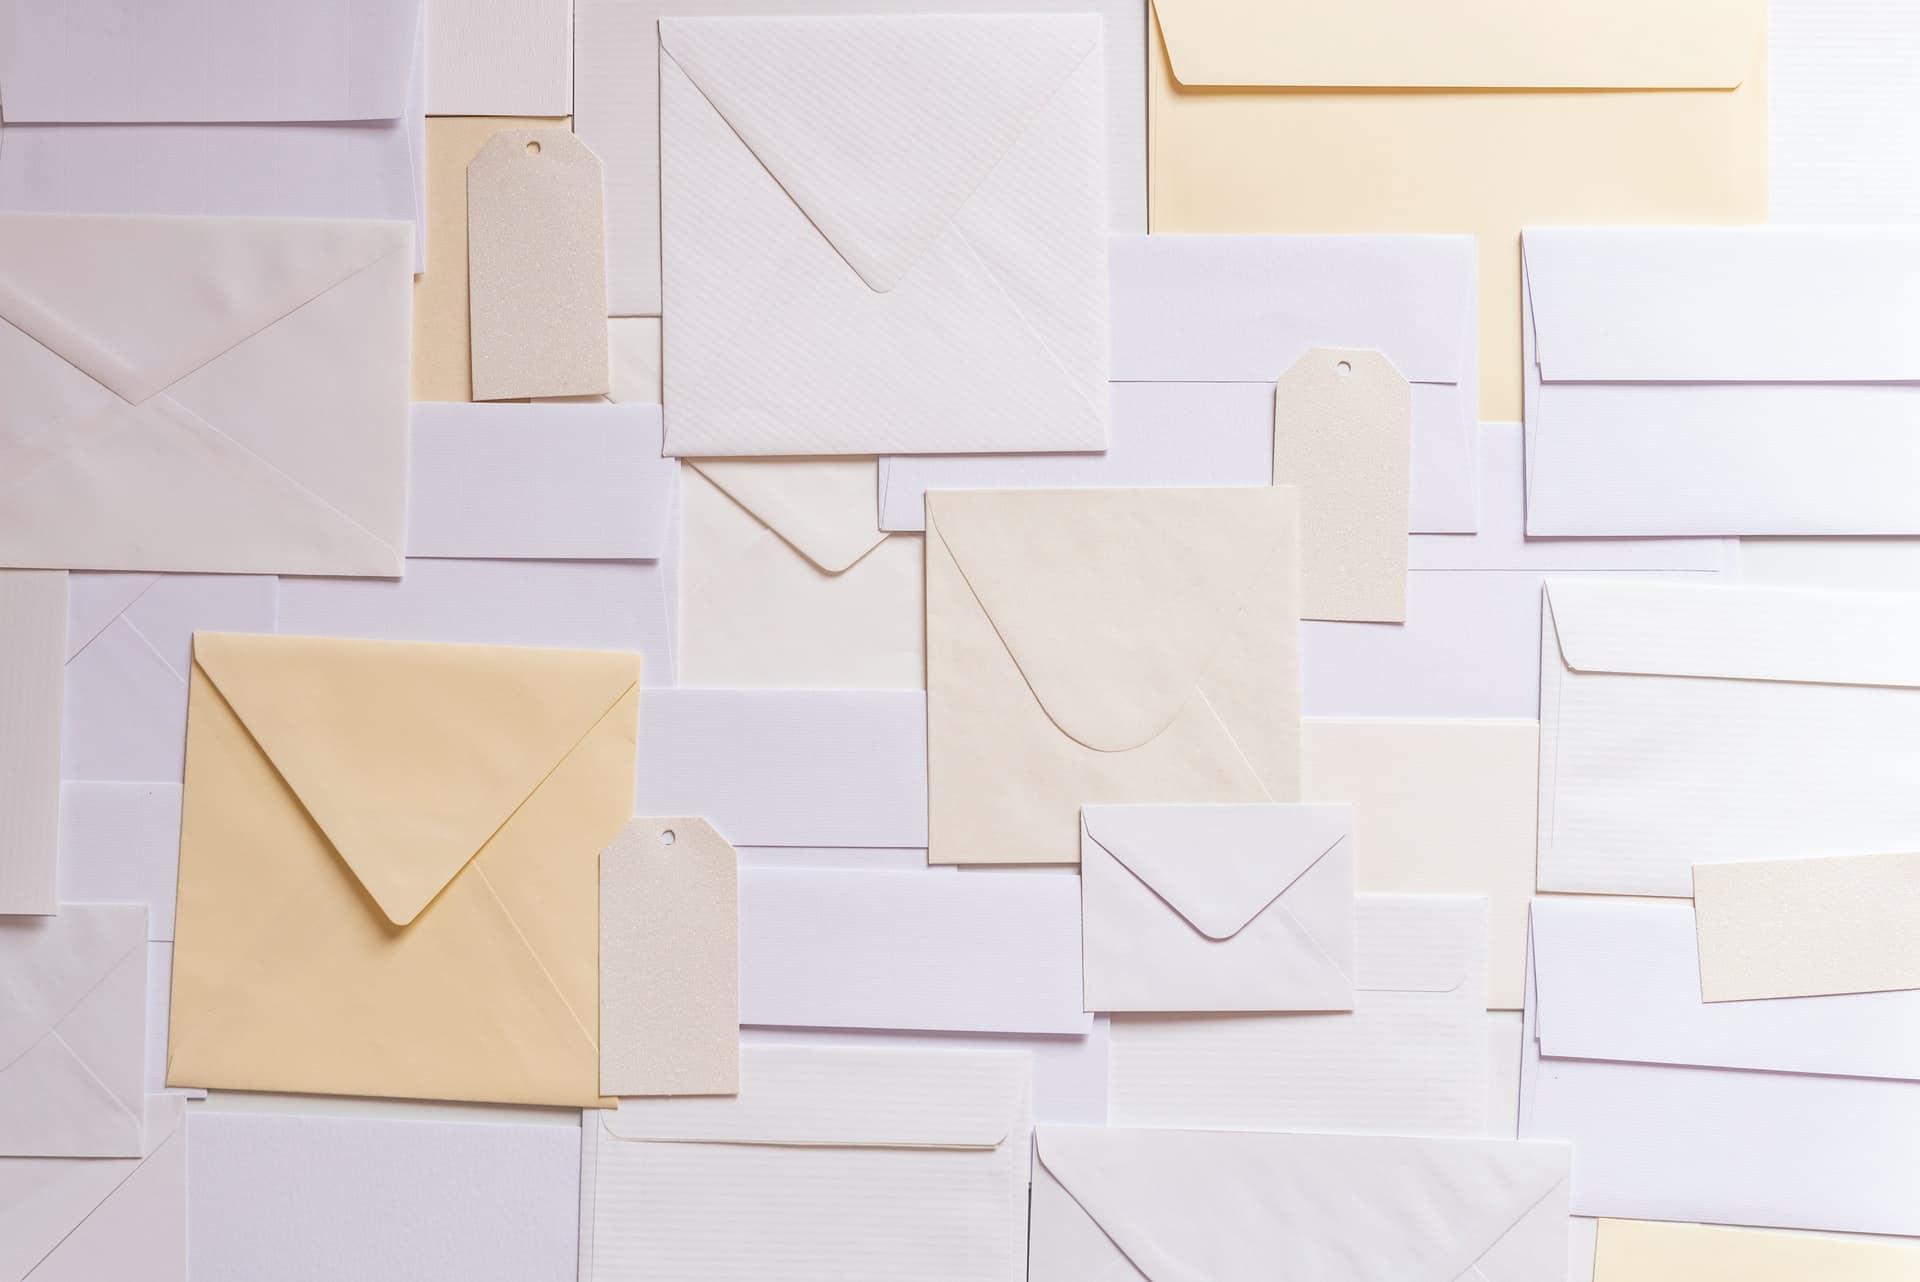 Sobres para correo (email marketing)